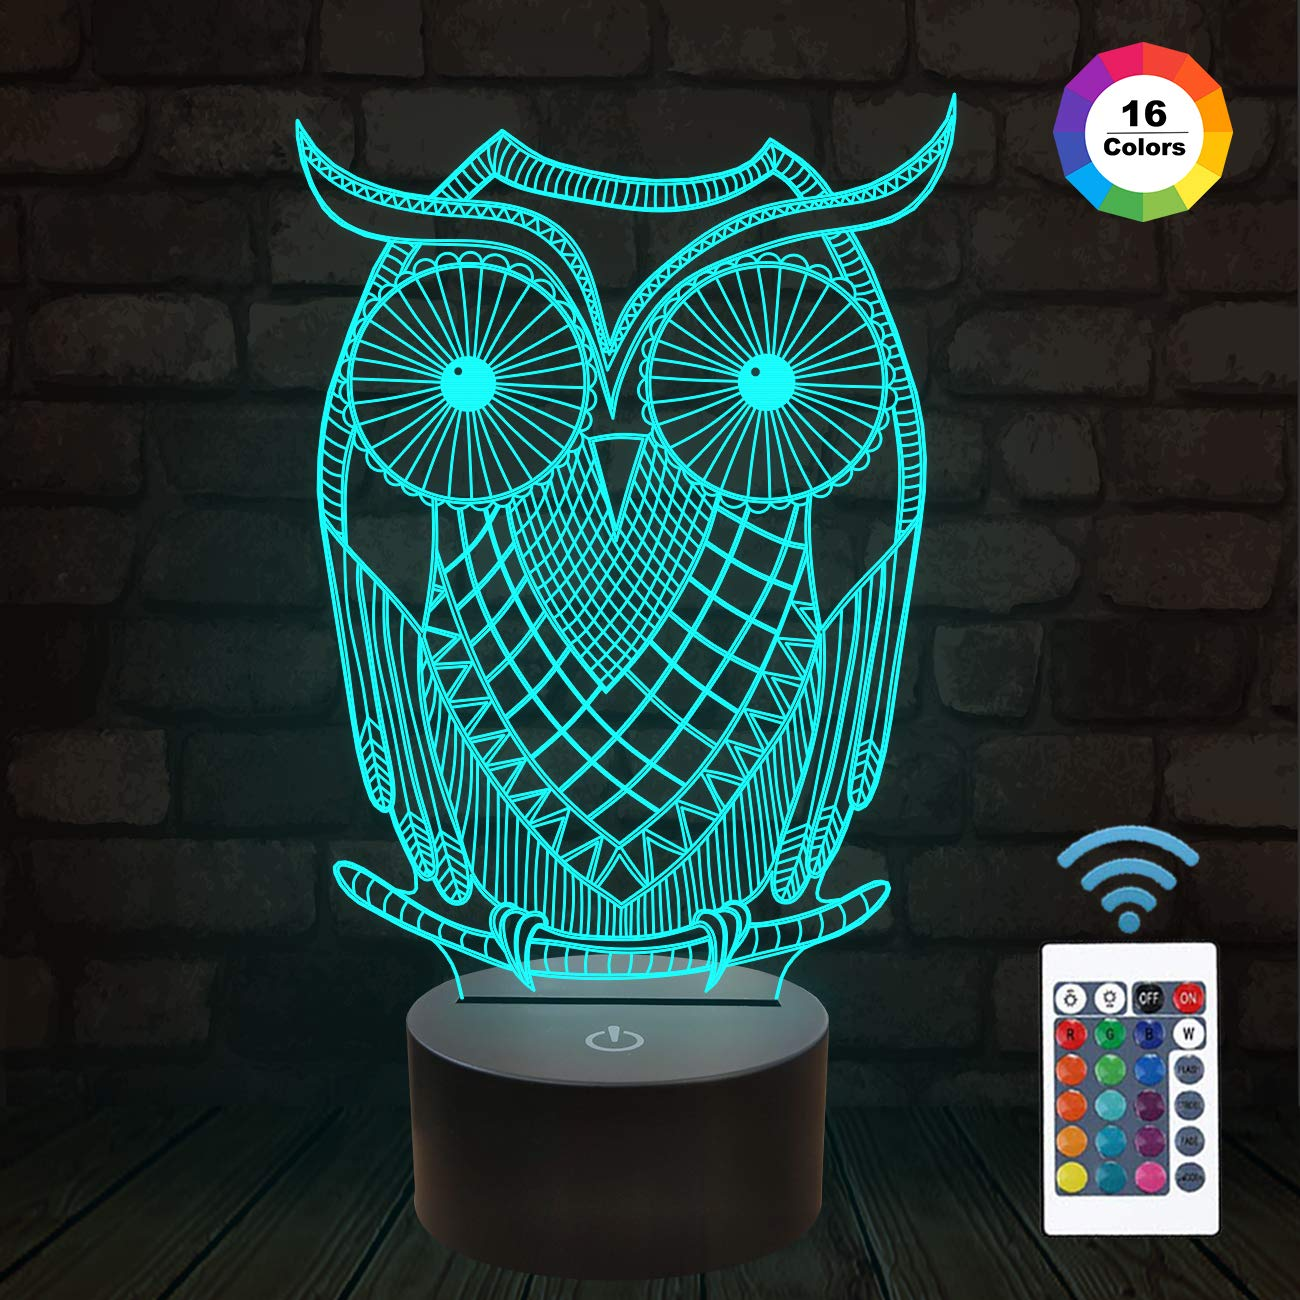 ویکالا · خرید  اصل اورجینال · خرید از آمازون · FULLOSUN Owl Gifts, 3D Owl Night Light Decorations for Home, Creative 3D Illusion Lamp for Kids as Birthday Xmas with 16 Colors Changing & Remote Control & Dimmable Function wekala · ویکالا